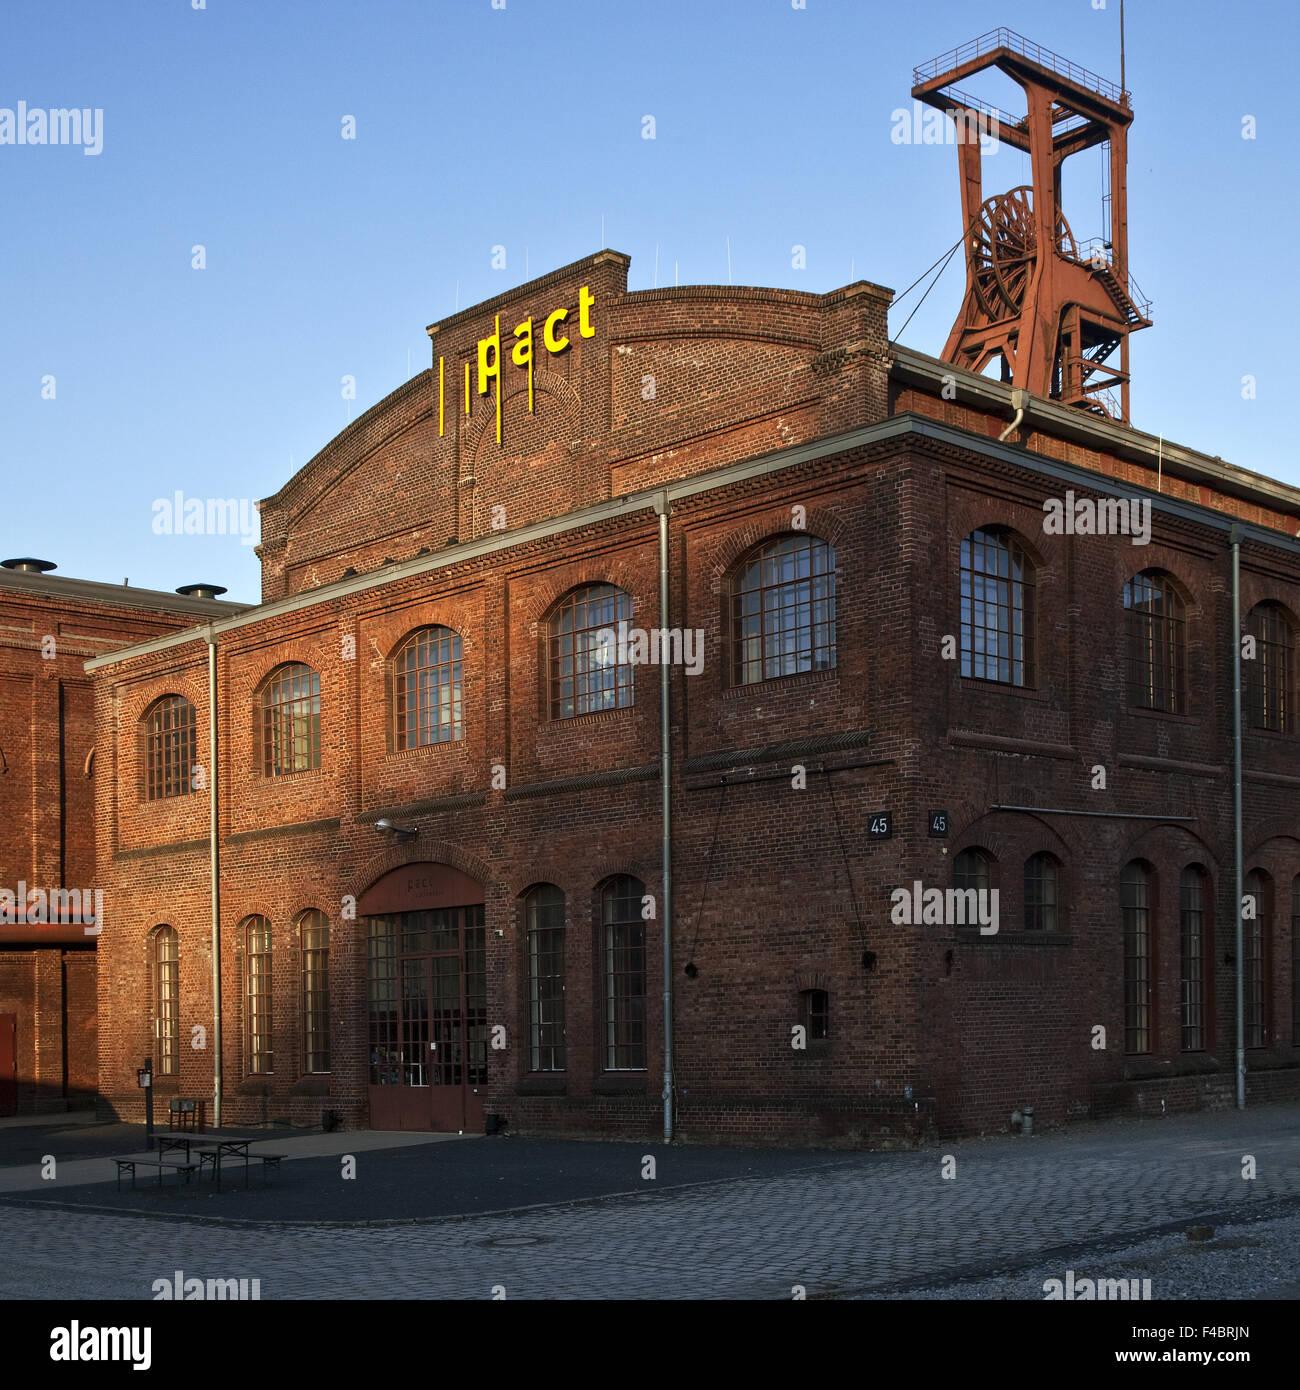 PACT Zollverein, Essen, Germany - Stock Image